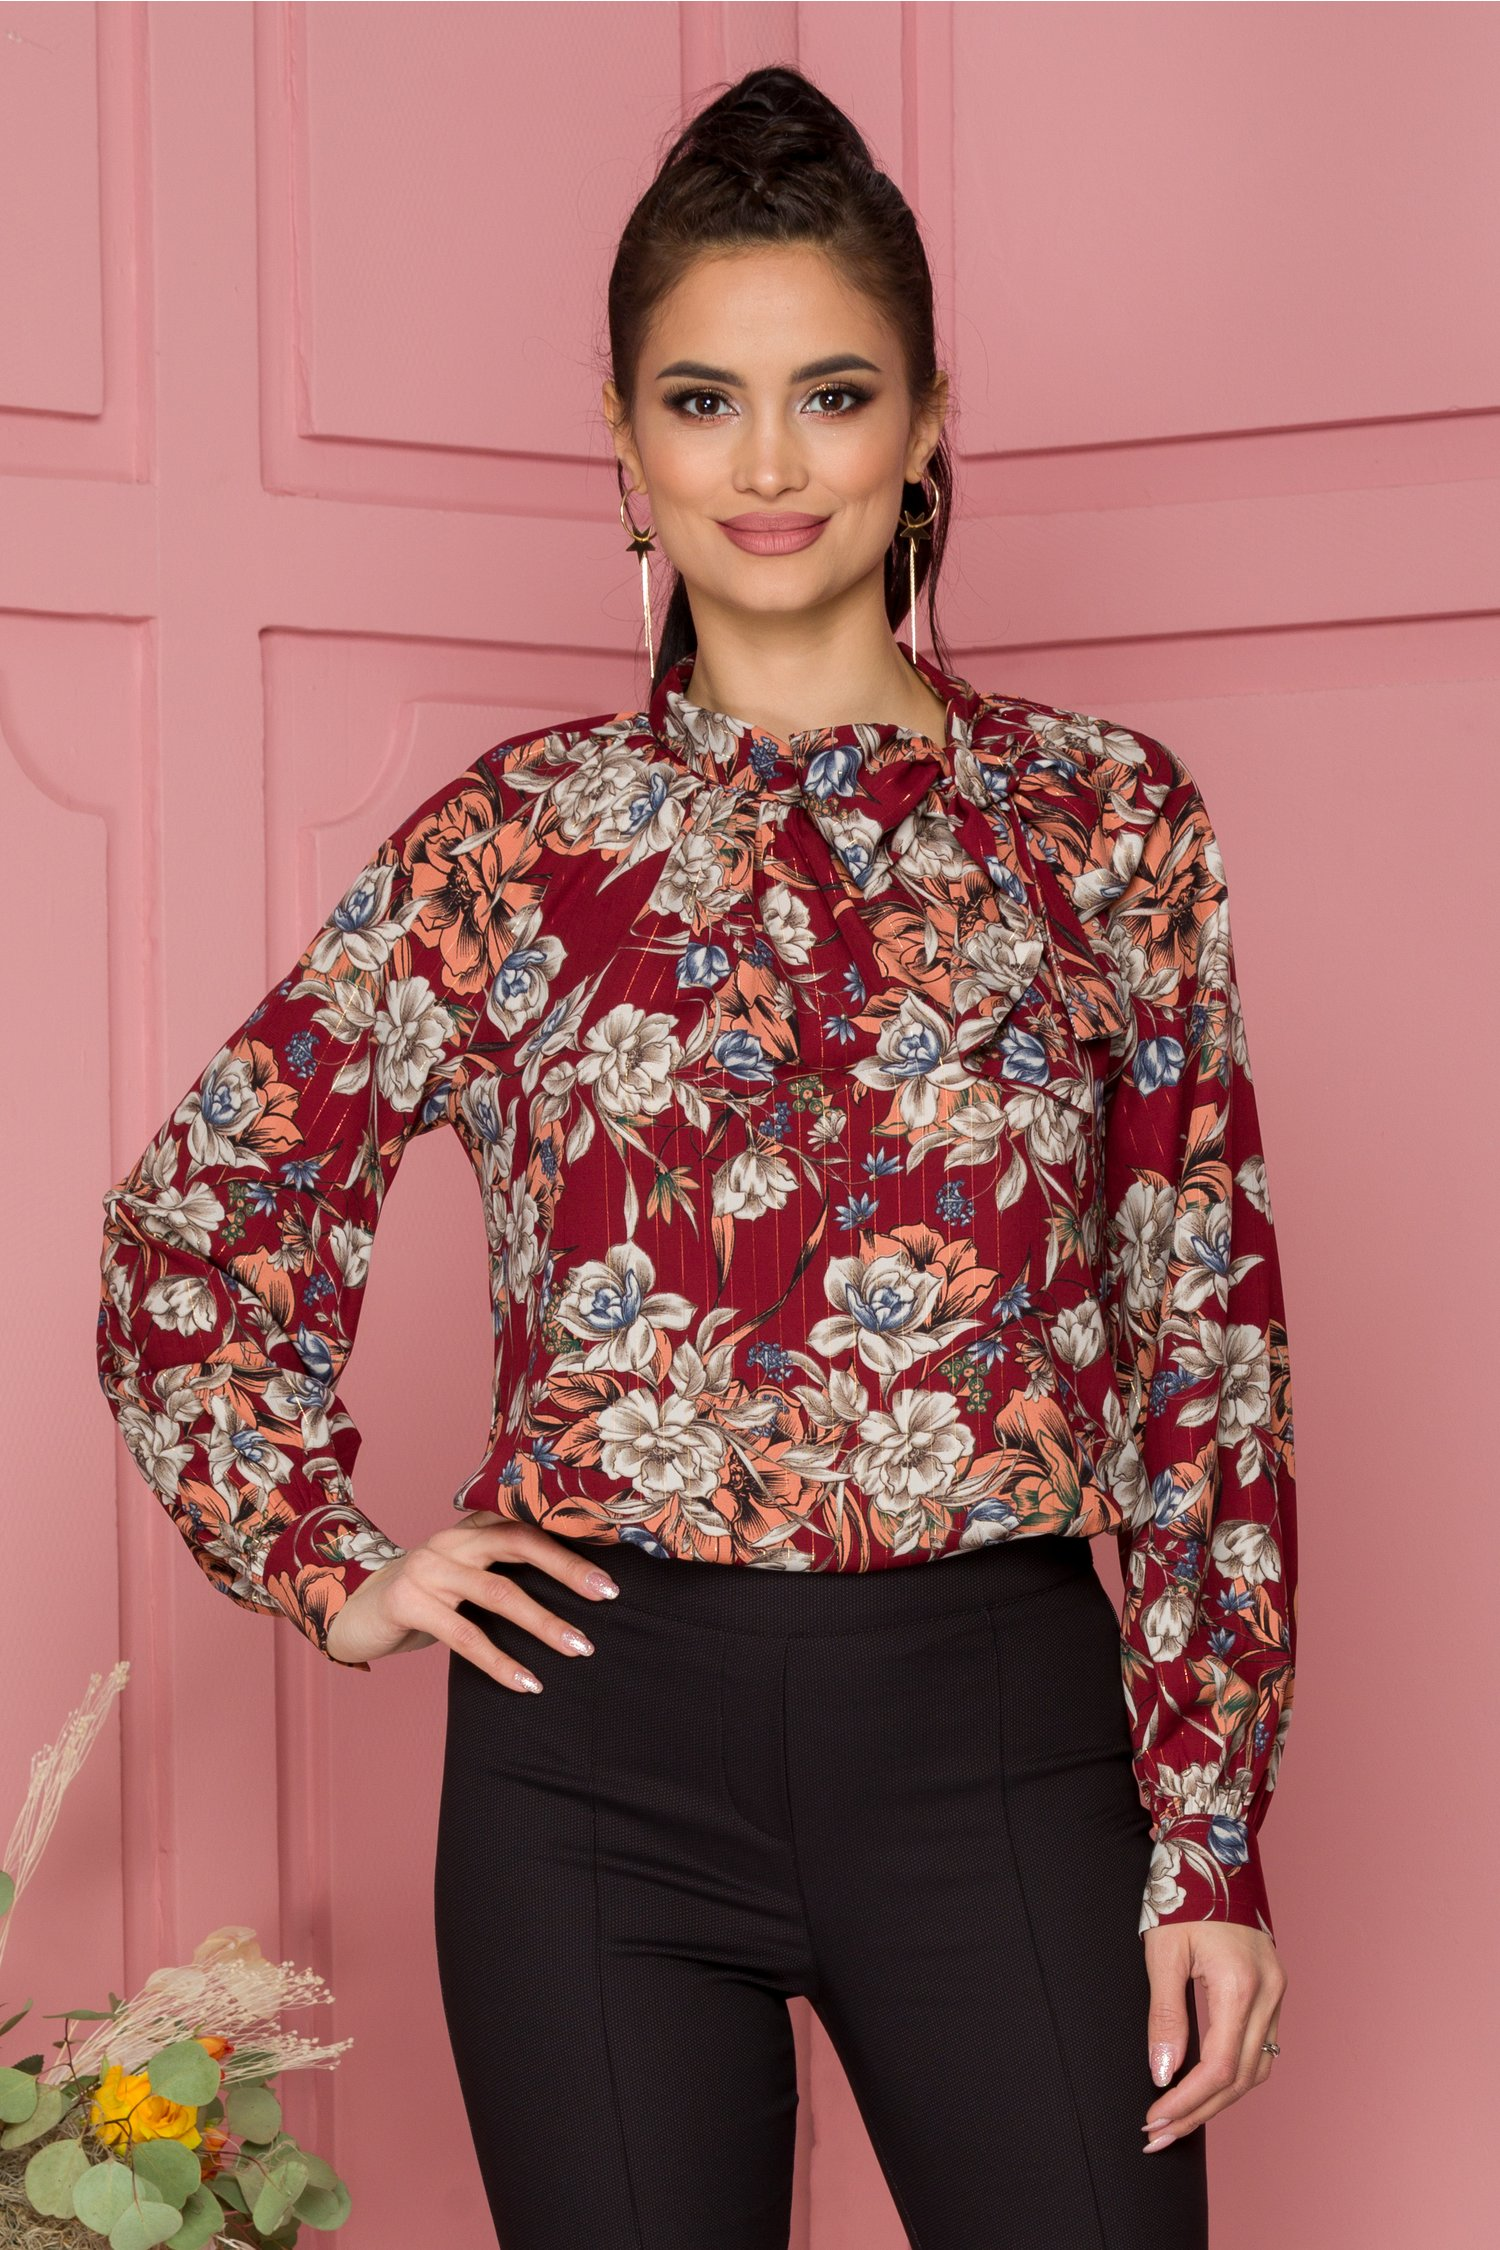 Bluza Leonard Collection bordo cu imprimeu floral si insertii aurii